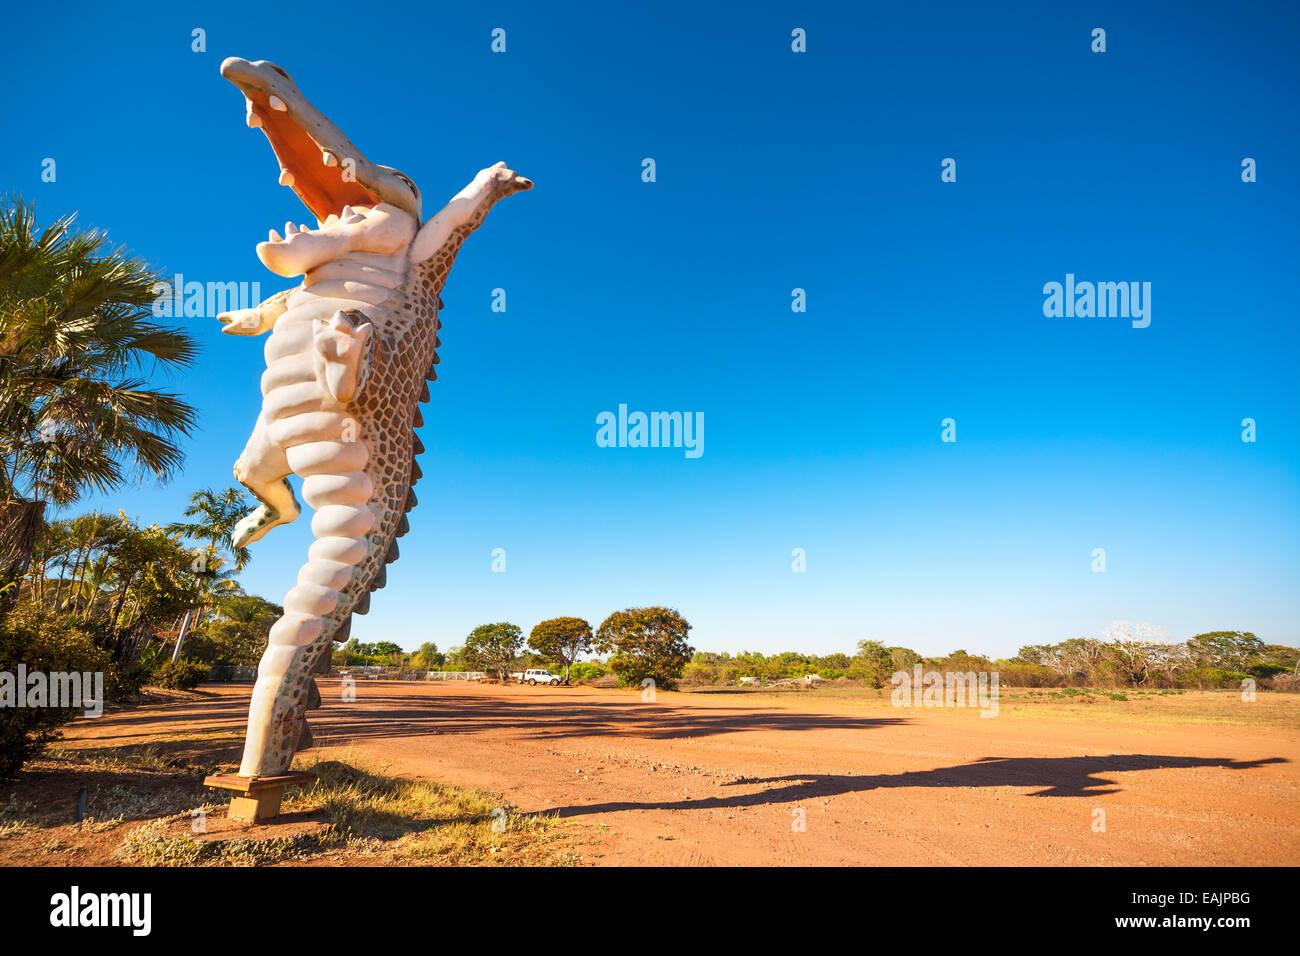 australia-road-side-attraction-big-croc-